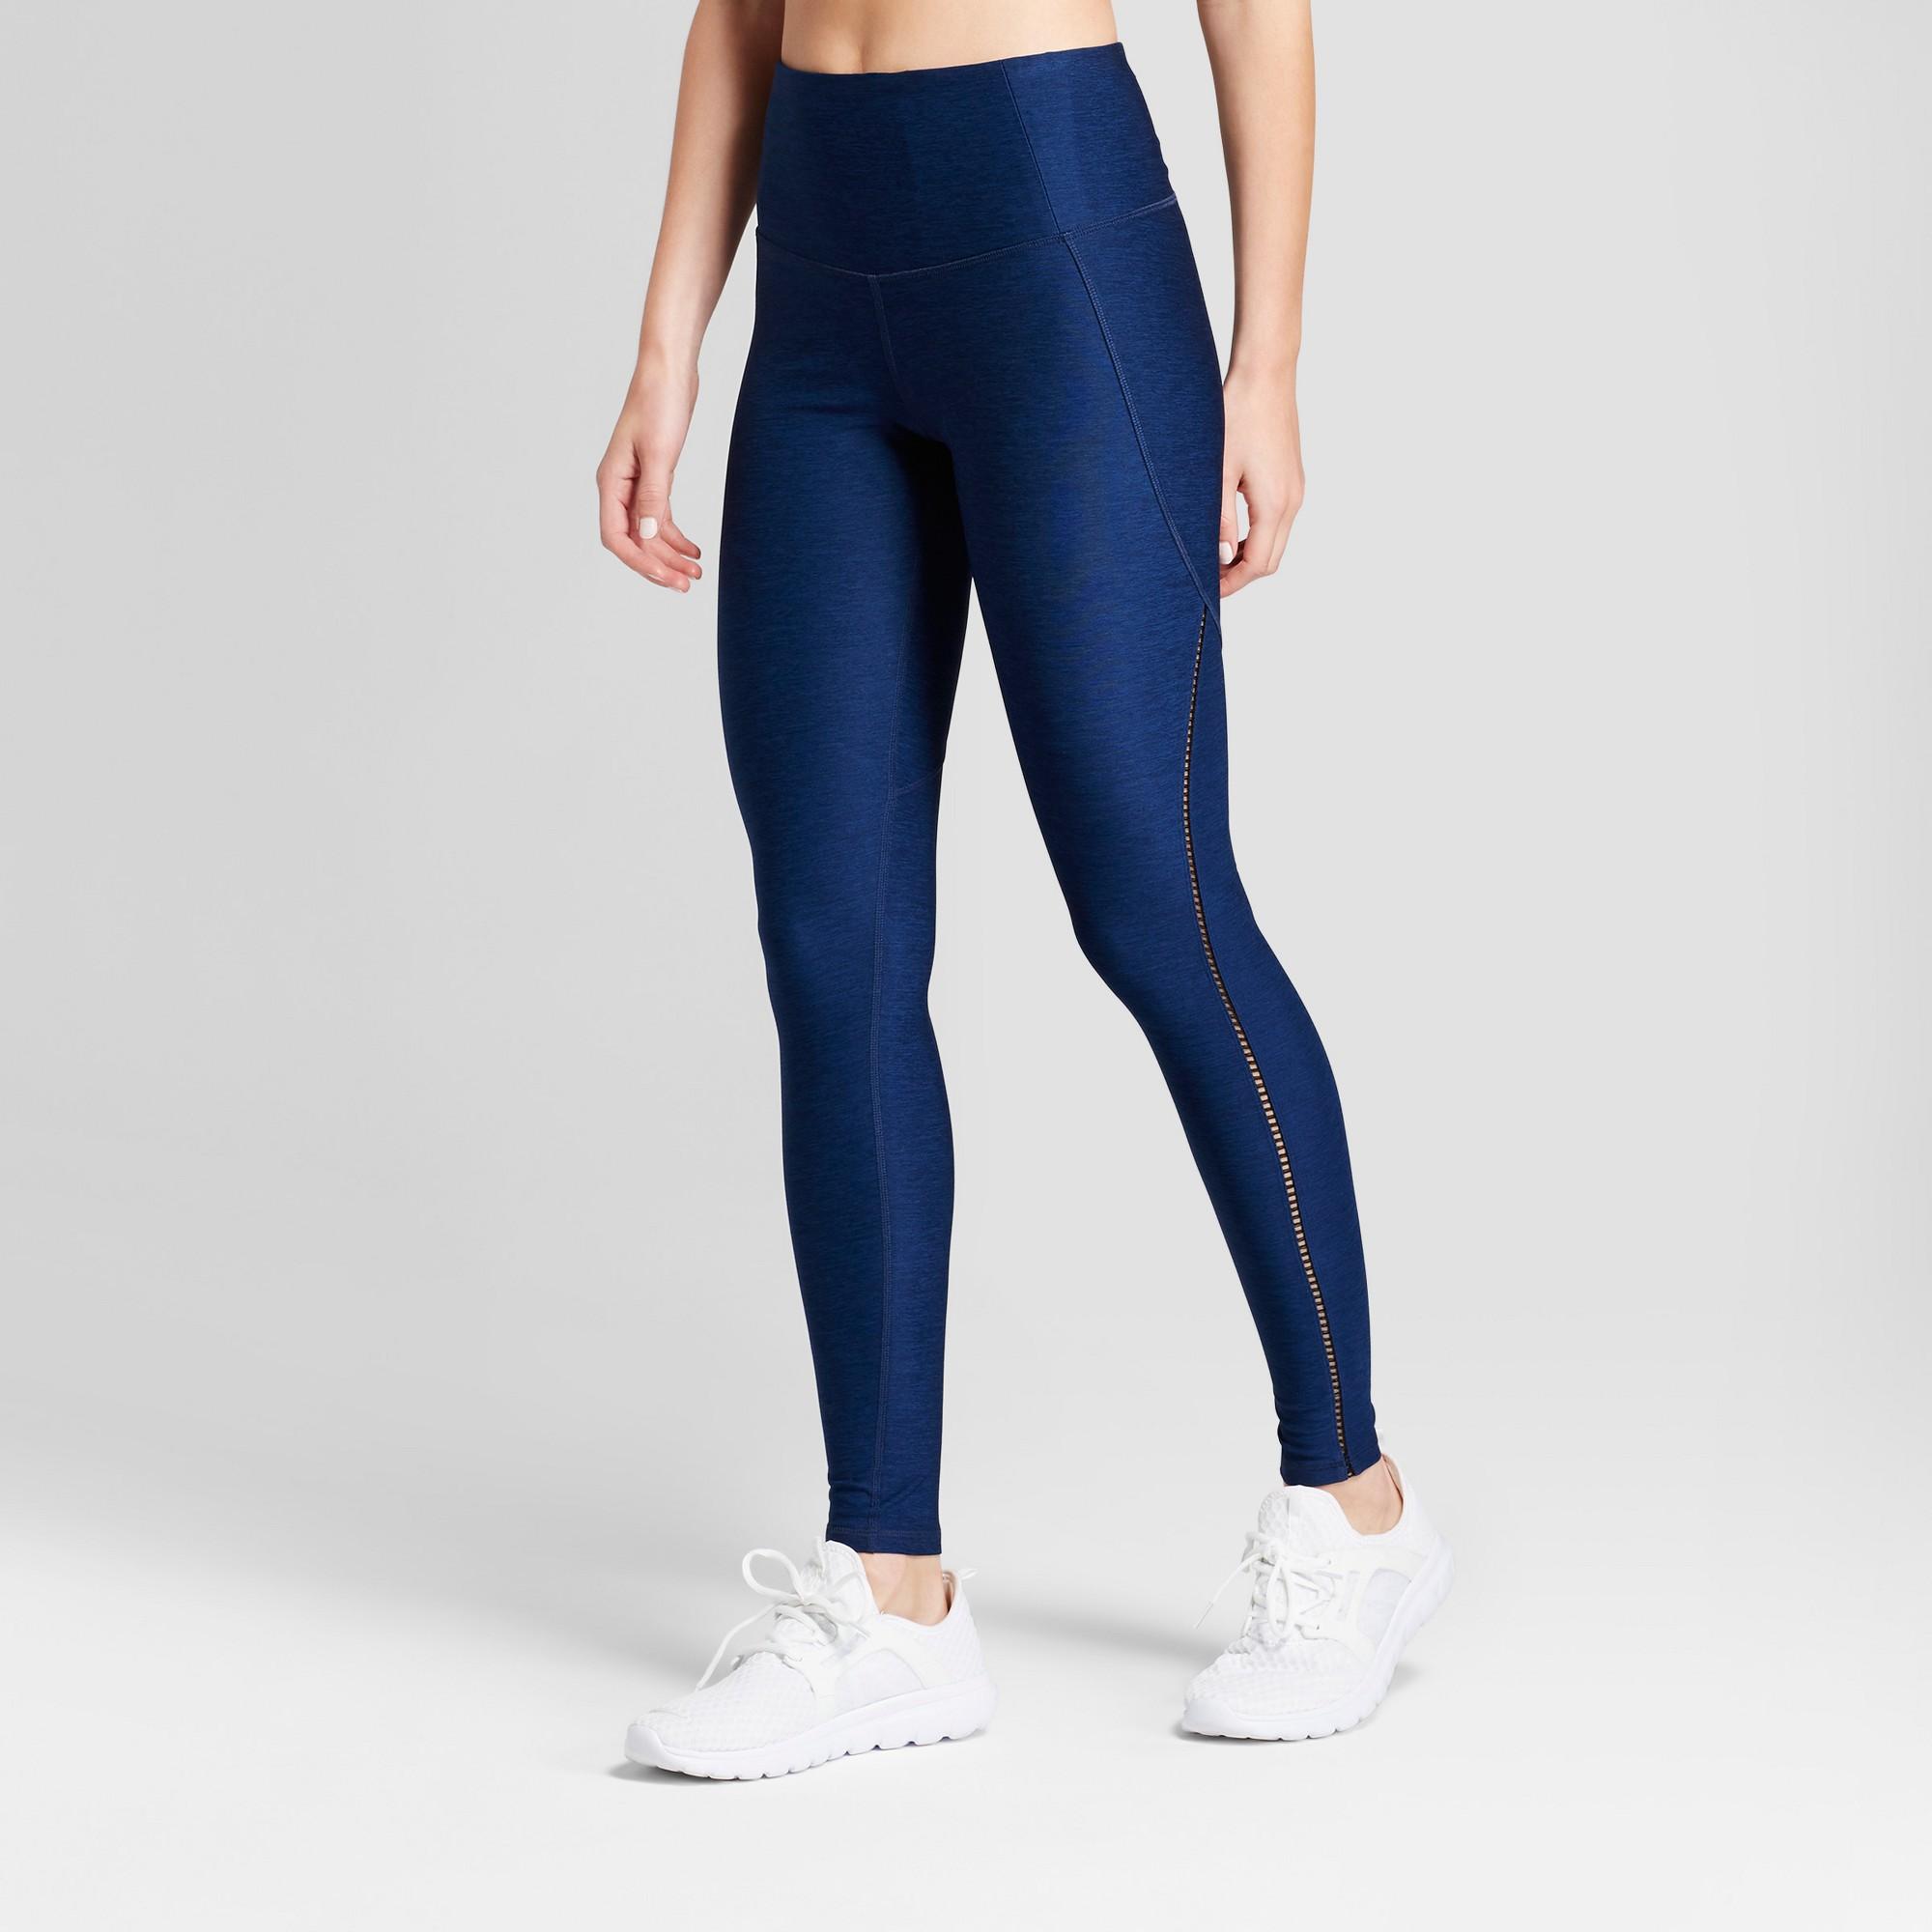 aa64edbc5534b Women's Freedom High-Waist Lattice Leggings - C9 Champion Midnight Blue  Heather Xxl